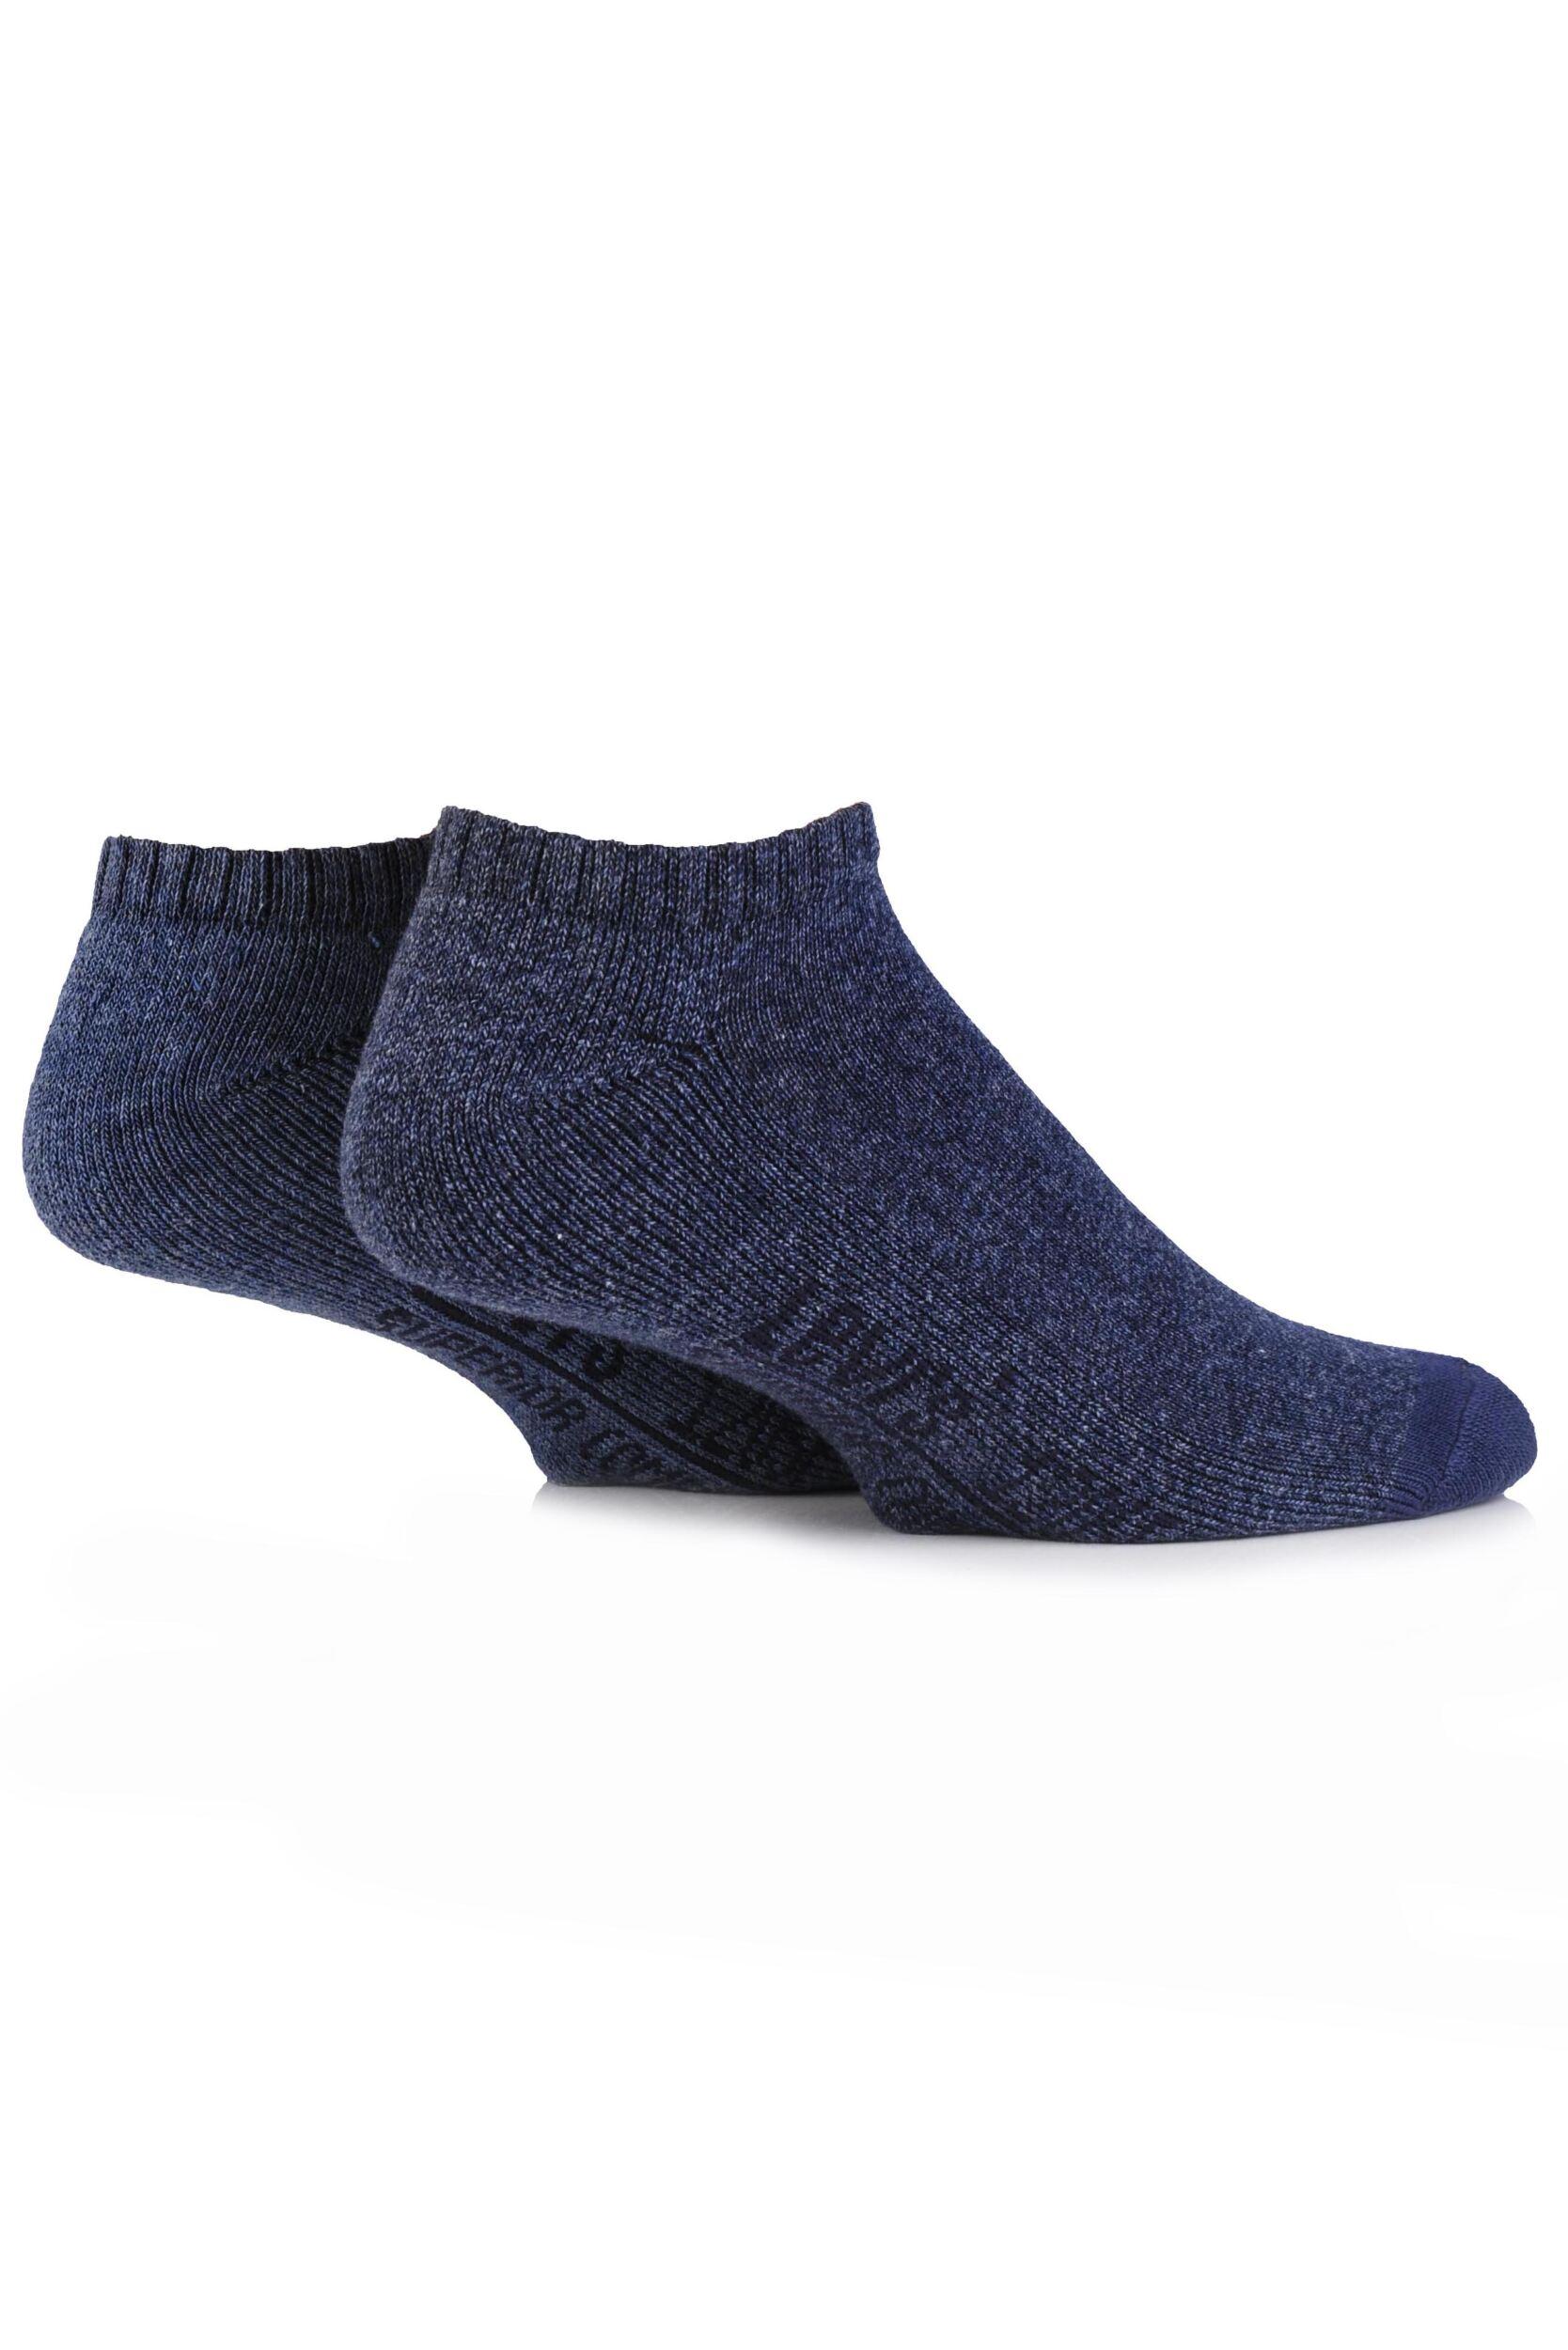 Image of Mens 2 Pair Levis 120SF Plain Cushioned Low Cut Socks